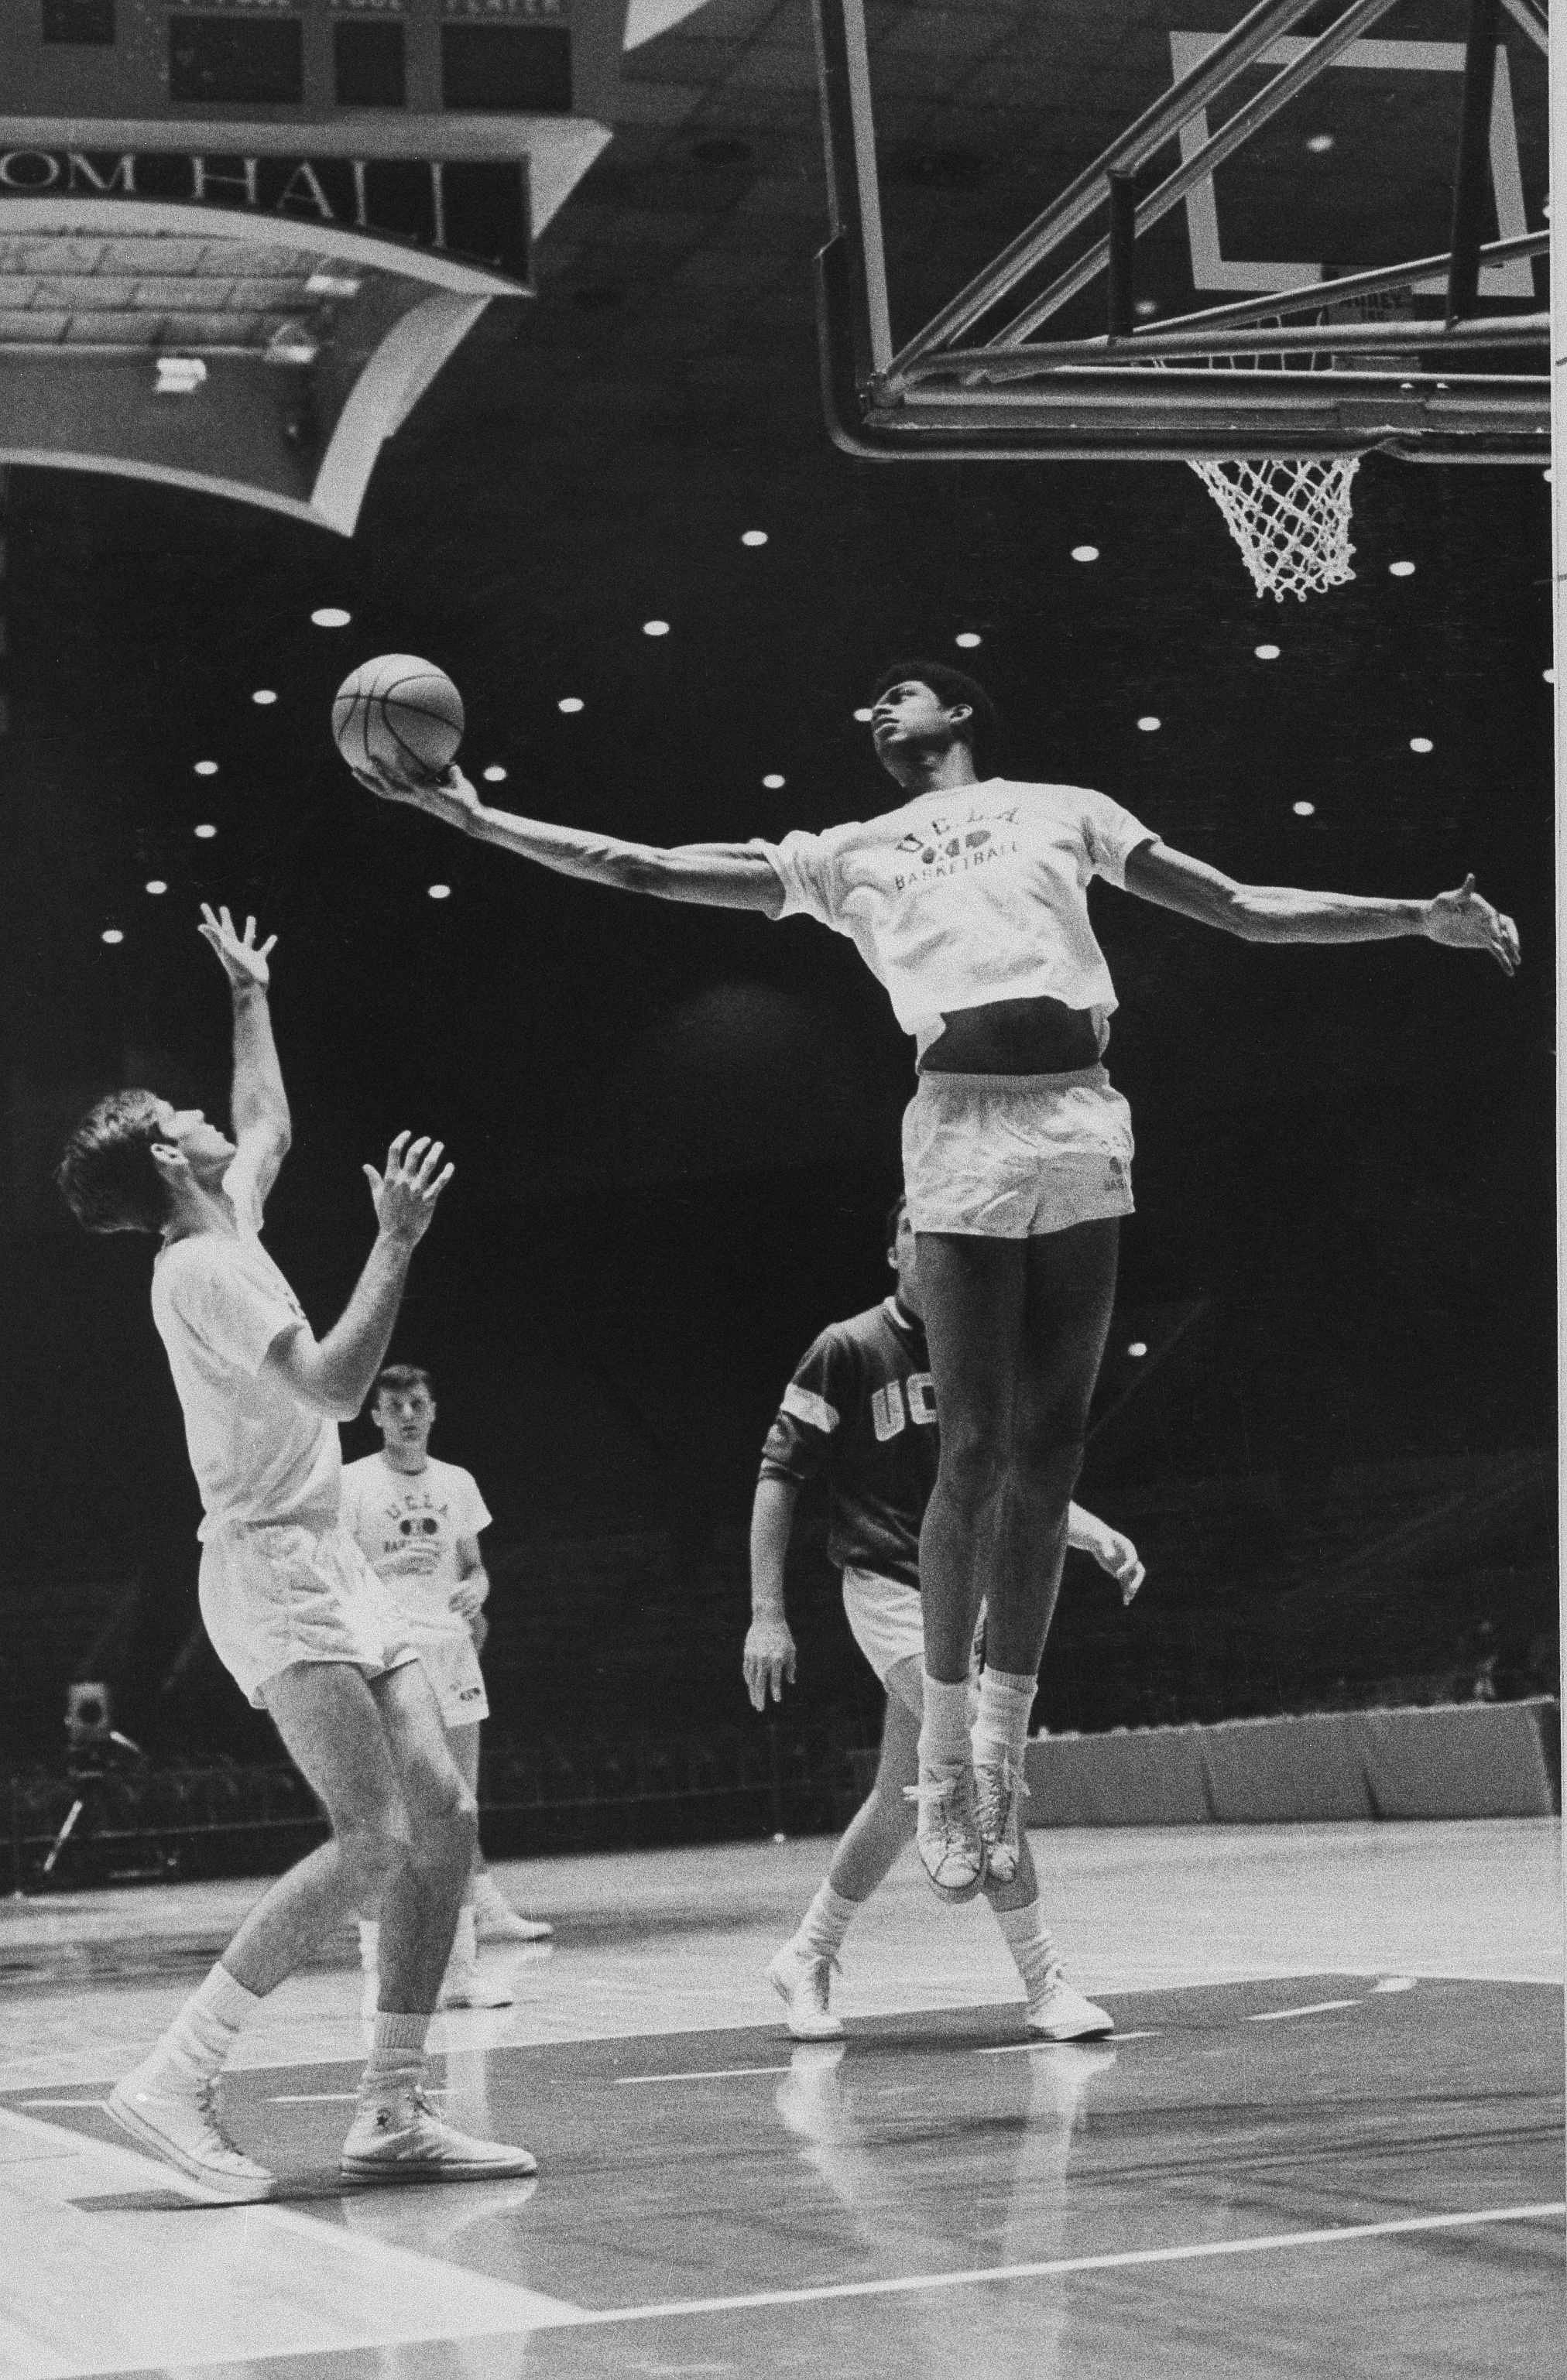 Lew Alcindor practices with UCLA teammates